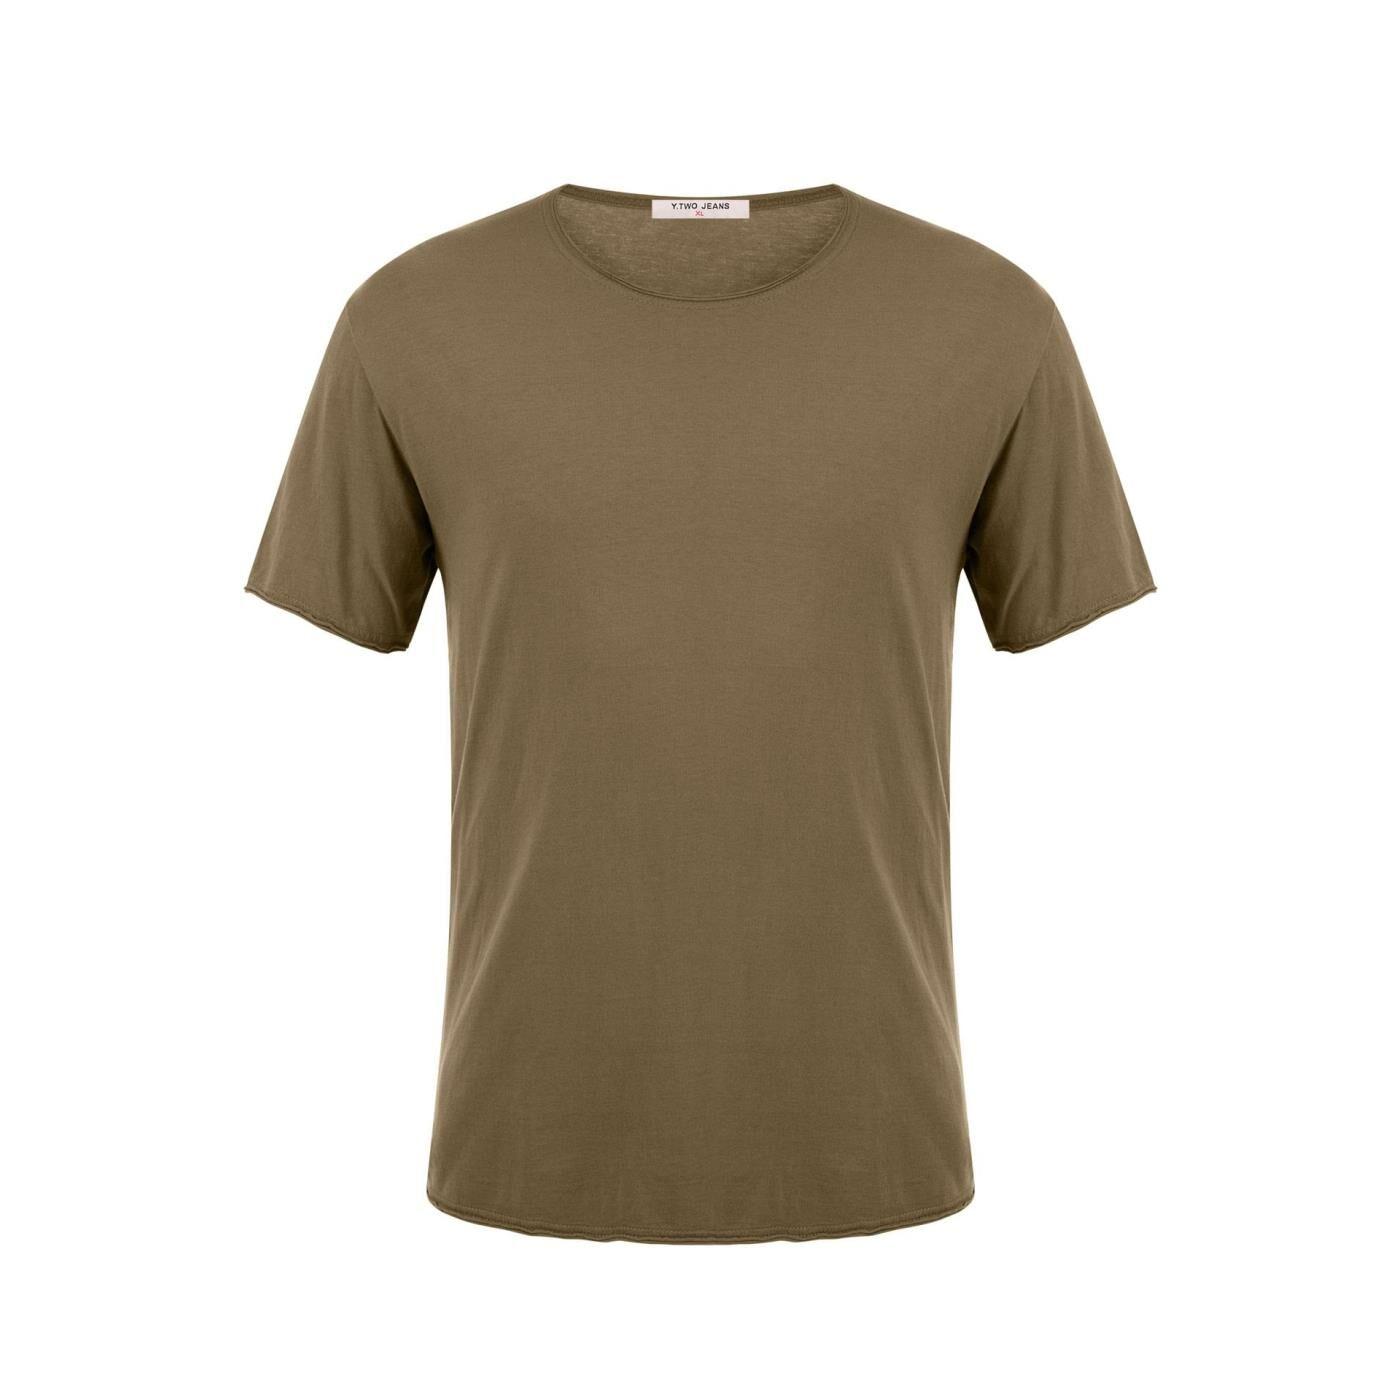 Celestino Ανδρικό T-shirt με αφινίριστο τελείωμα  - Λαδι - Grootte: Small